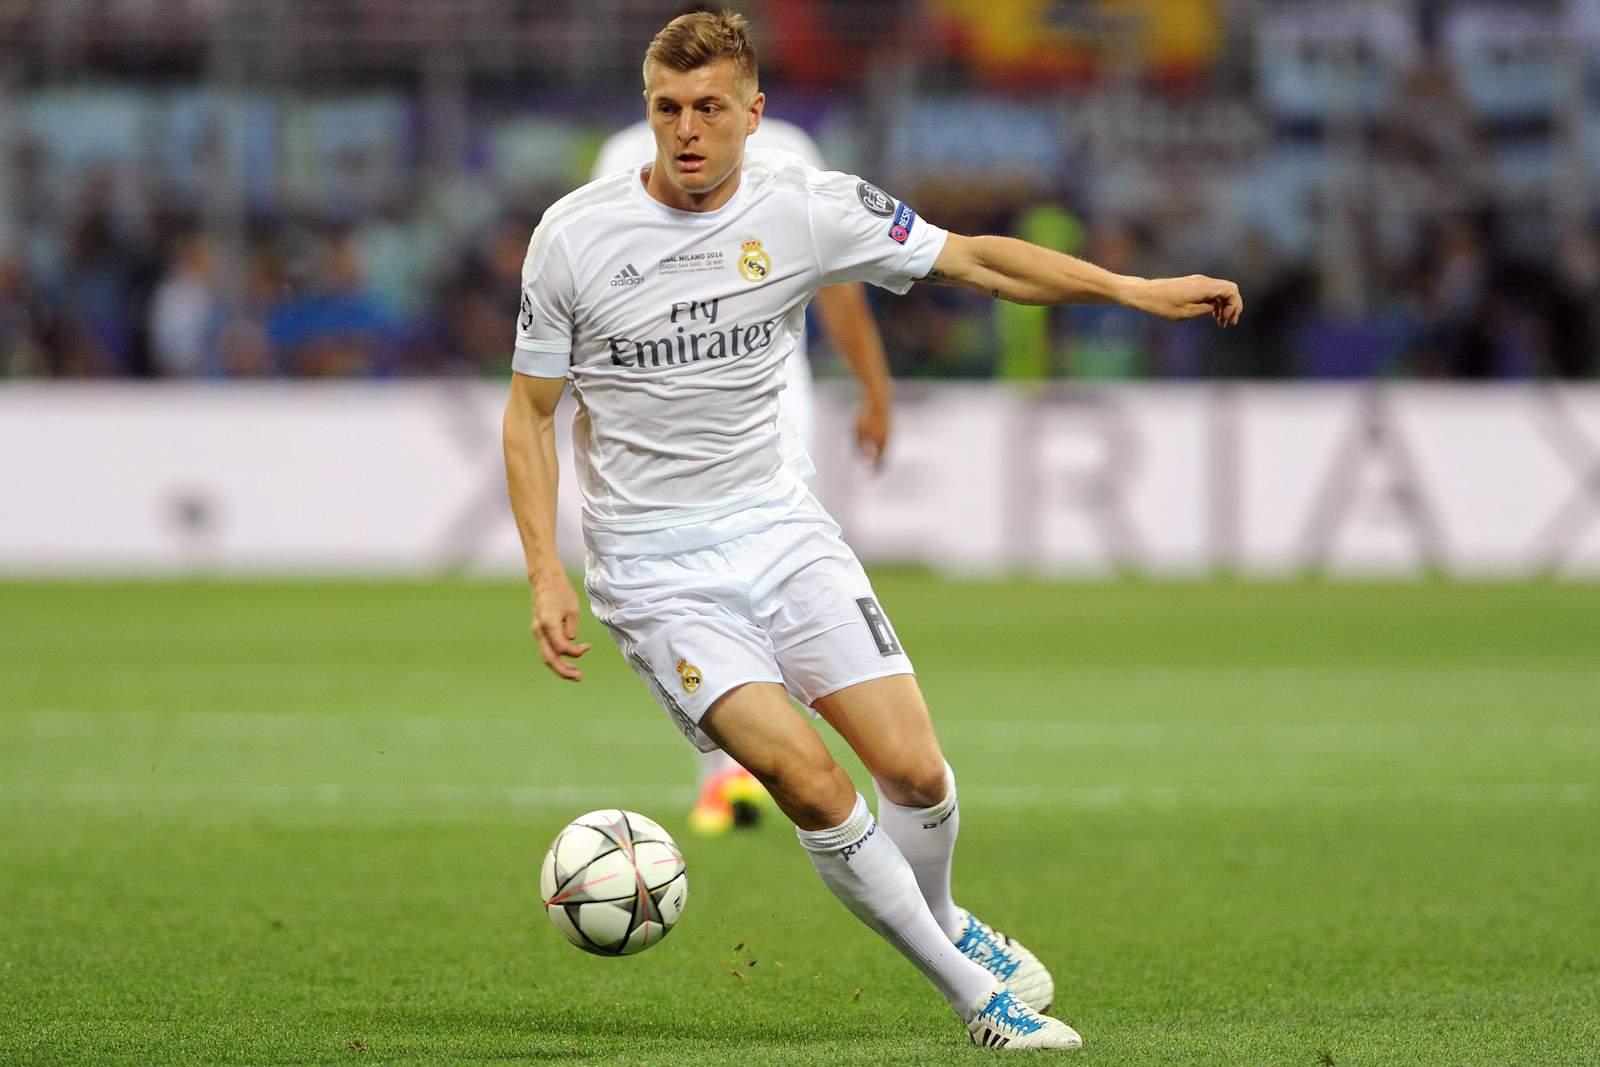 Toni Kroos in der Champions League. Jetzt auf Sporting gegen Real Madrid wetten!